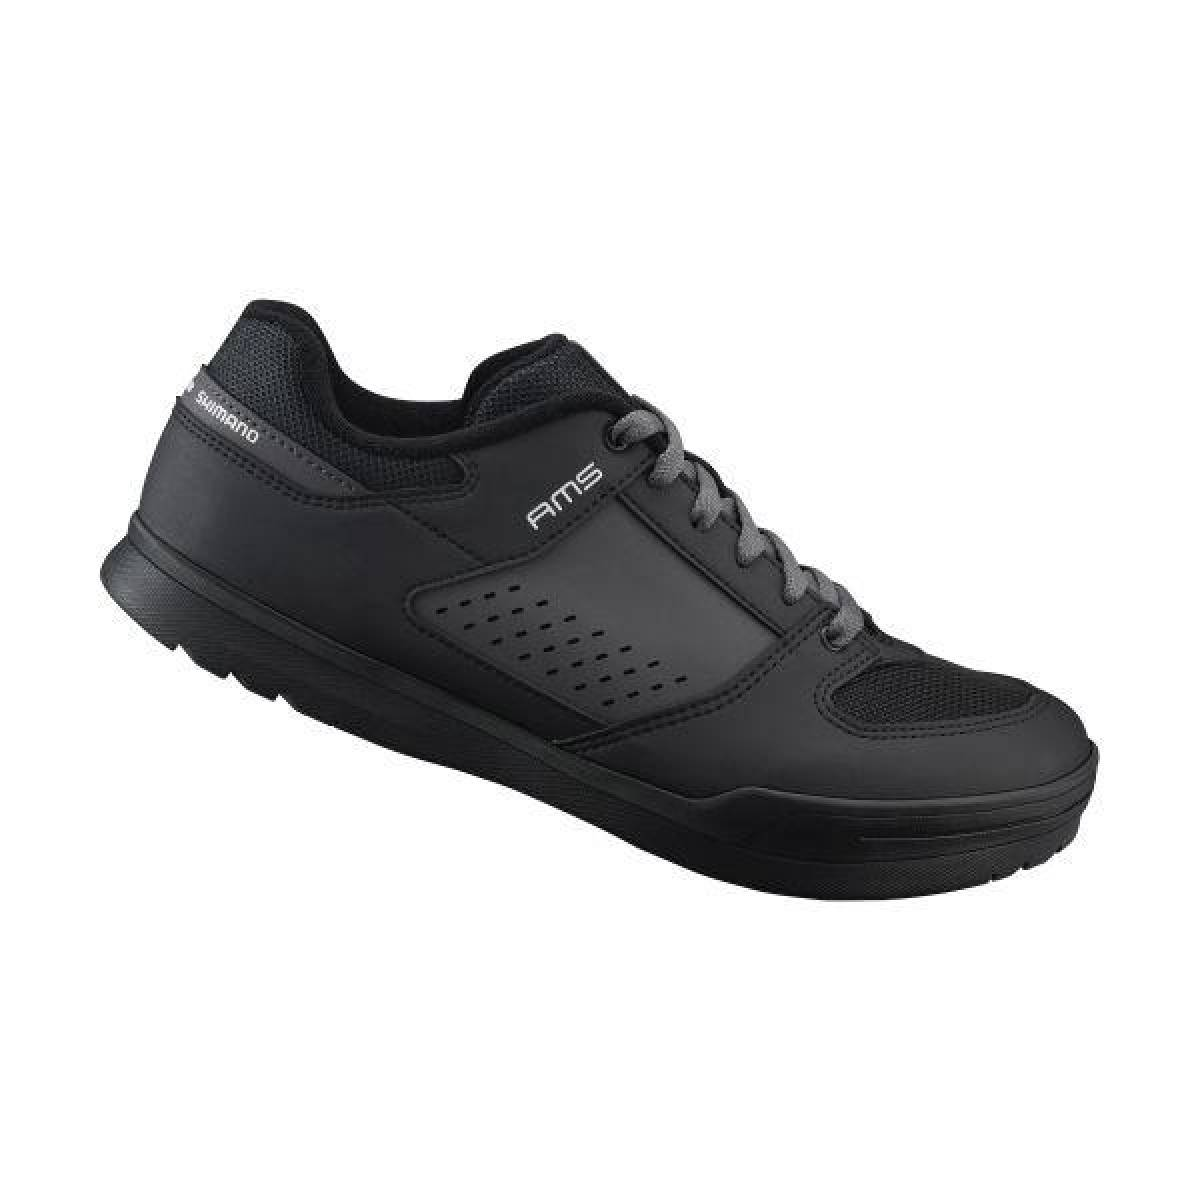 Shimano gravity obuv SH-AM501ML, černá, 42